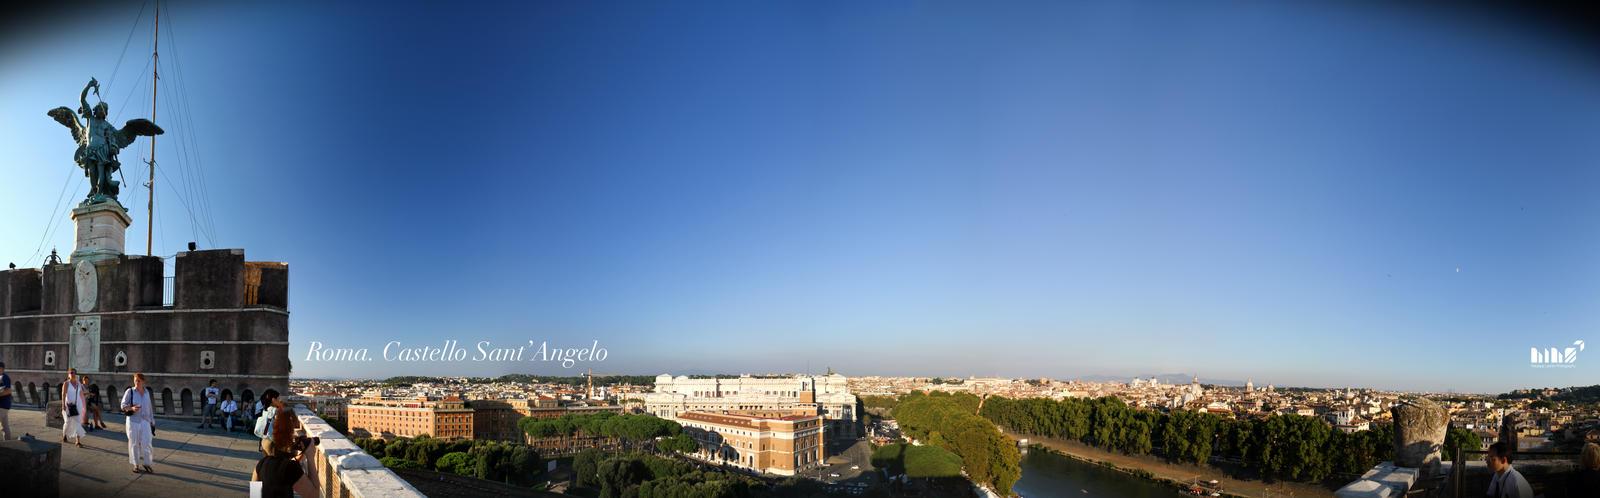 Roma - Castello Sant'Angelo